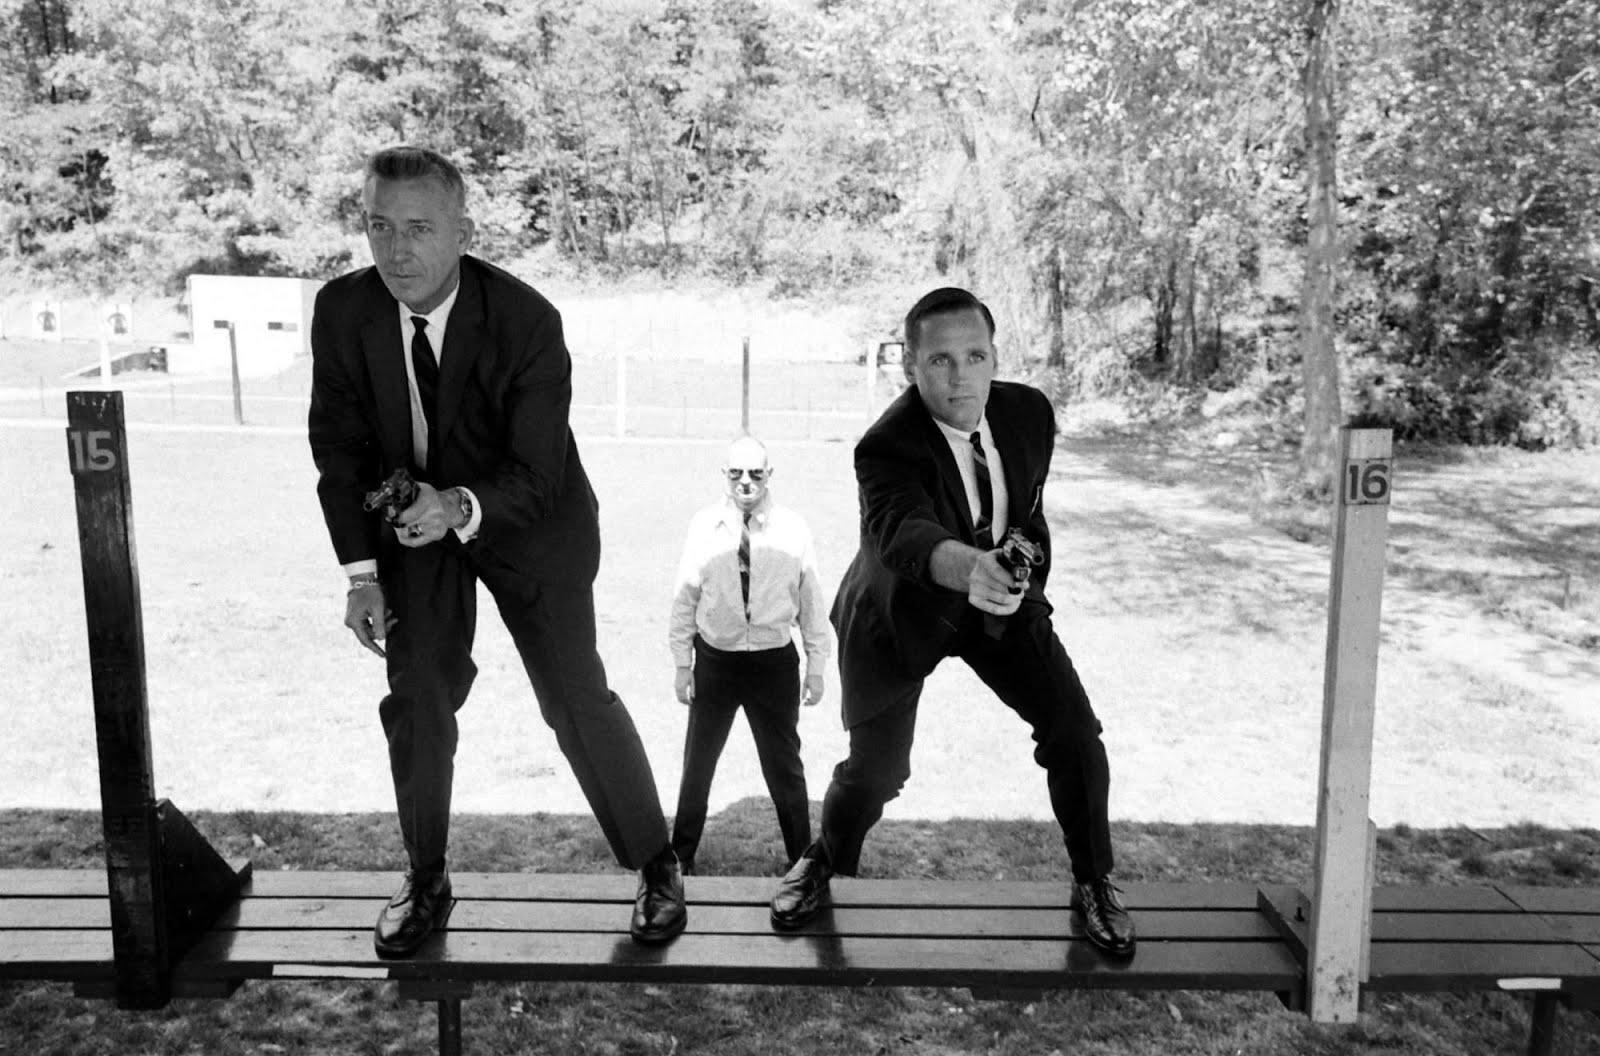 Secret Service agents Art Godfrey and Chuck Zboril